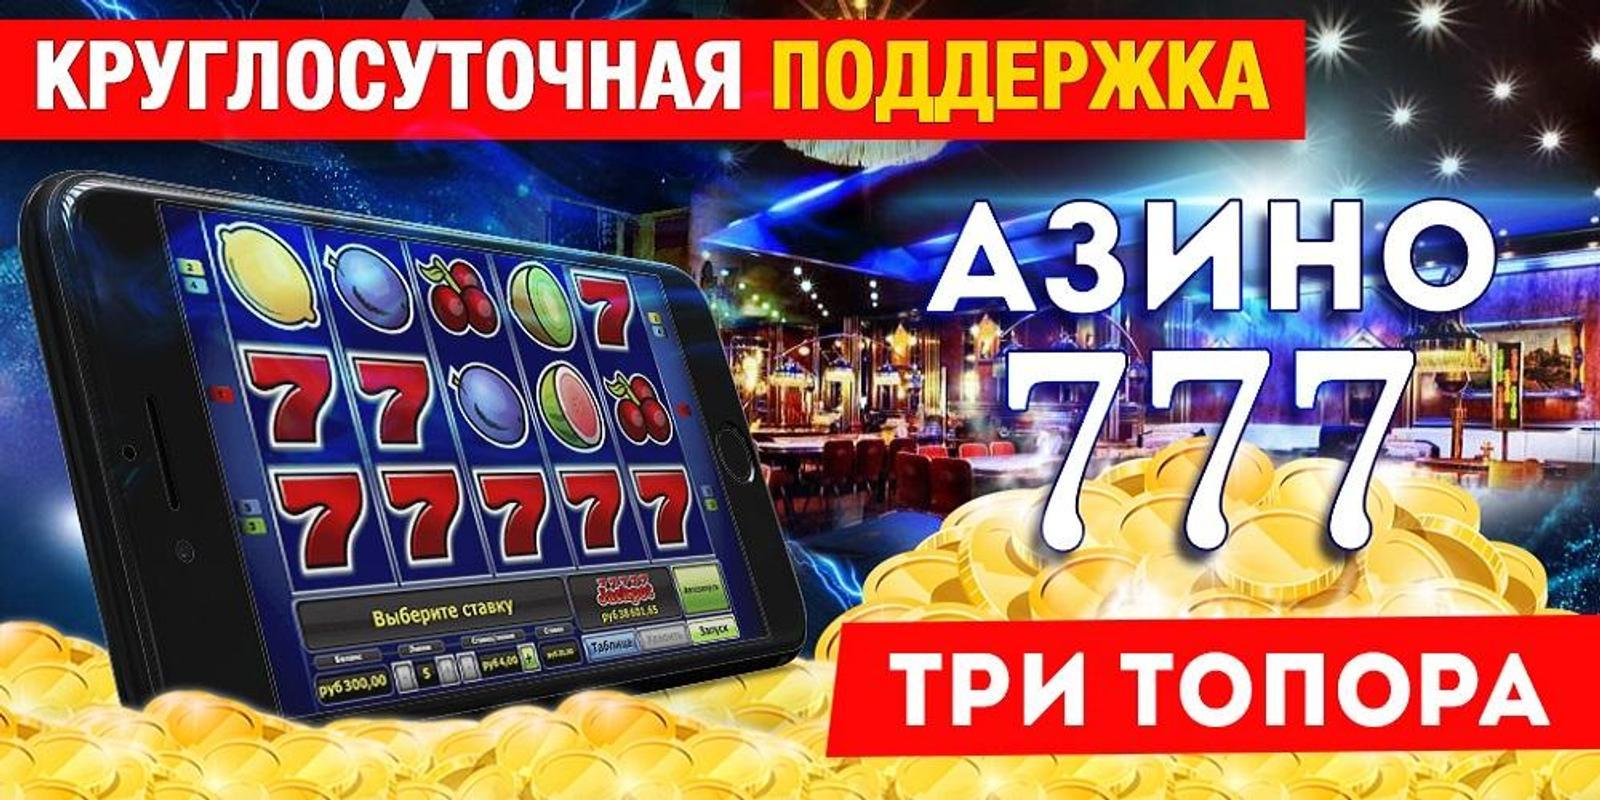 онлайн казино азино 3 топора